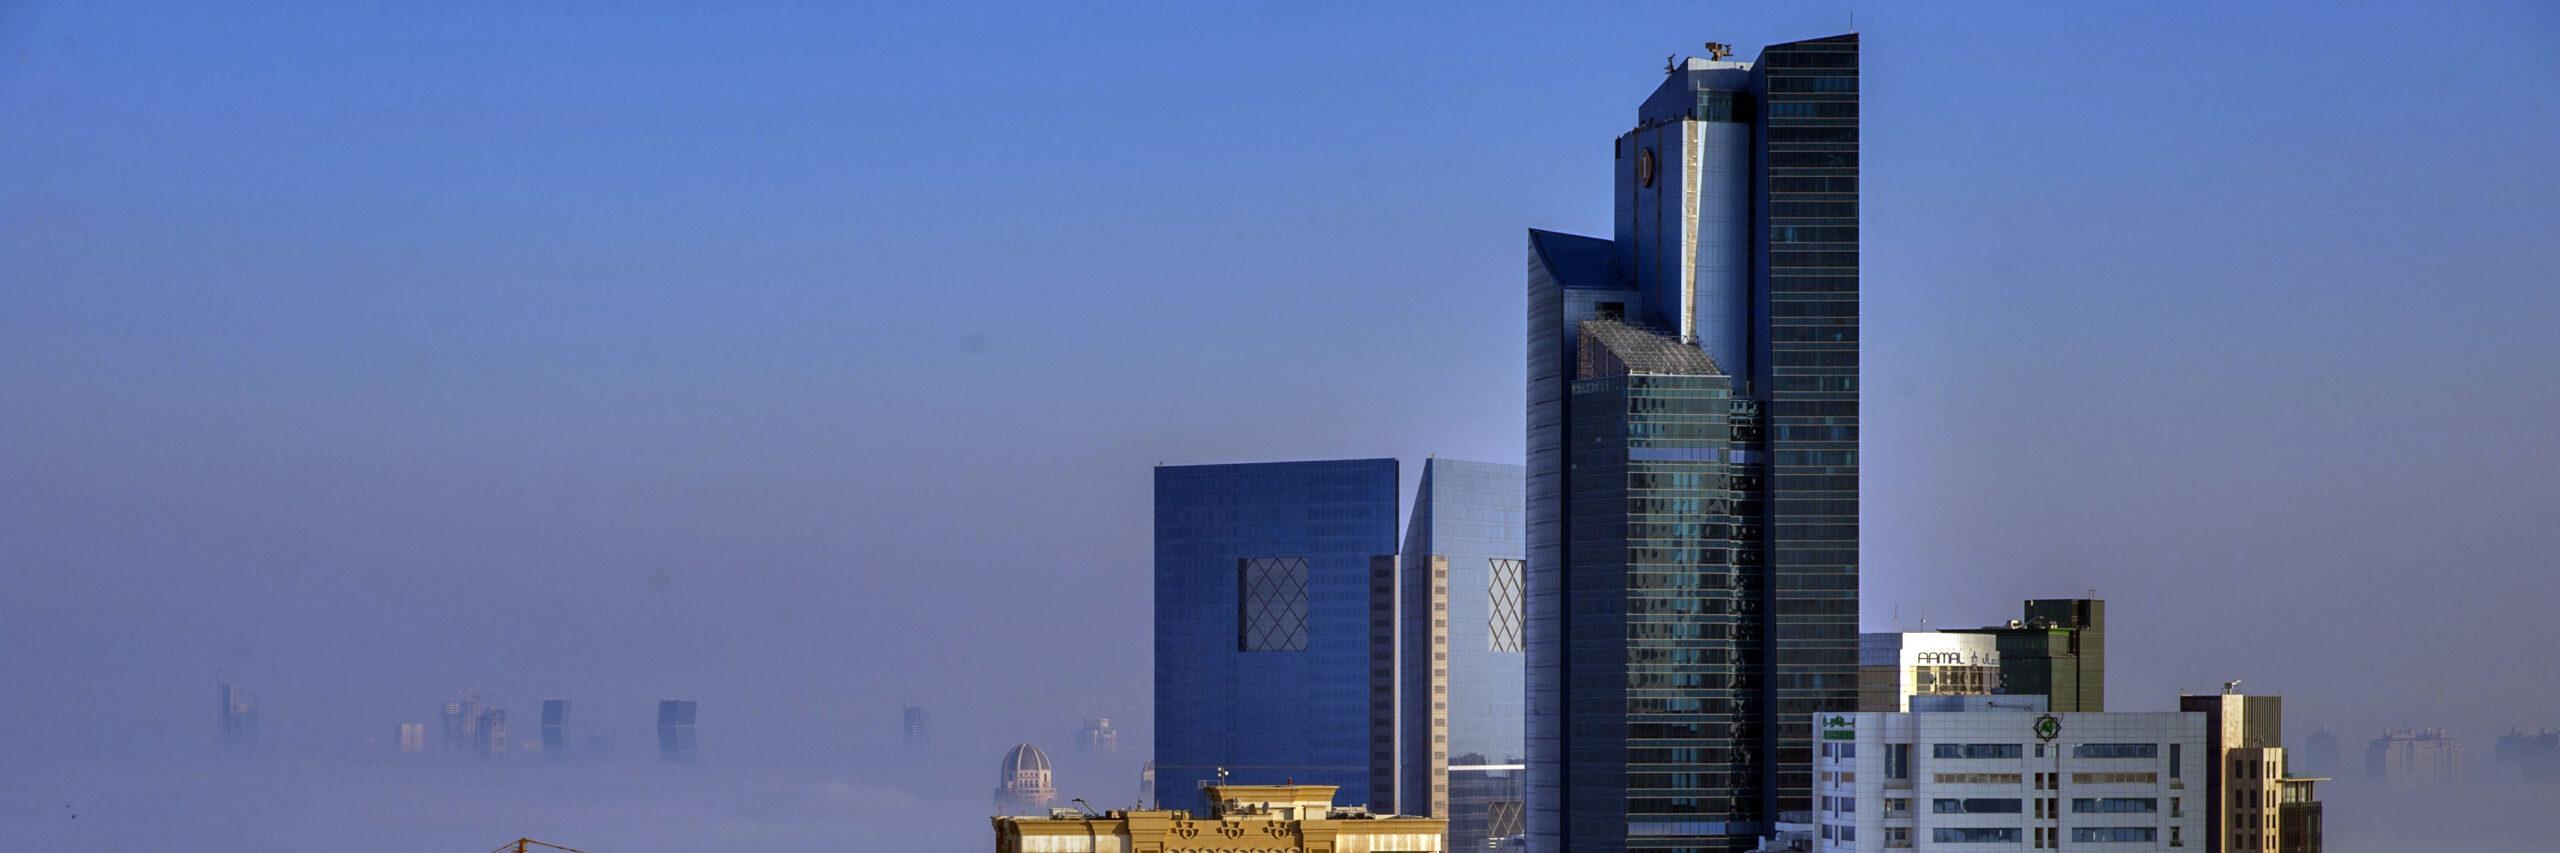 Qatar Silhouette Tower